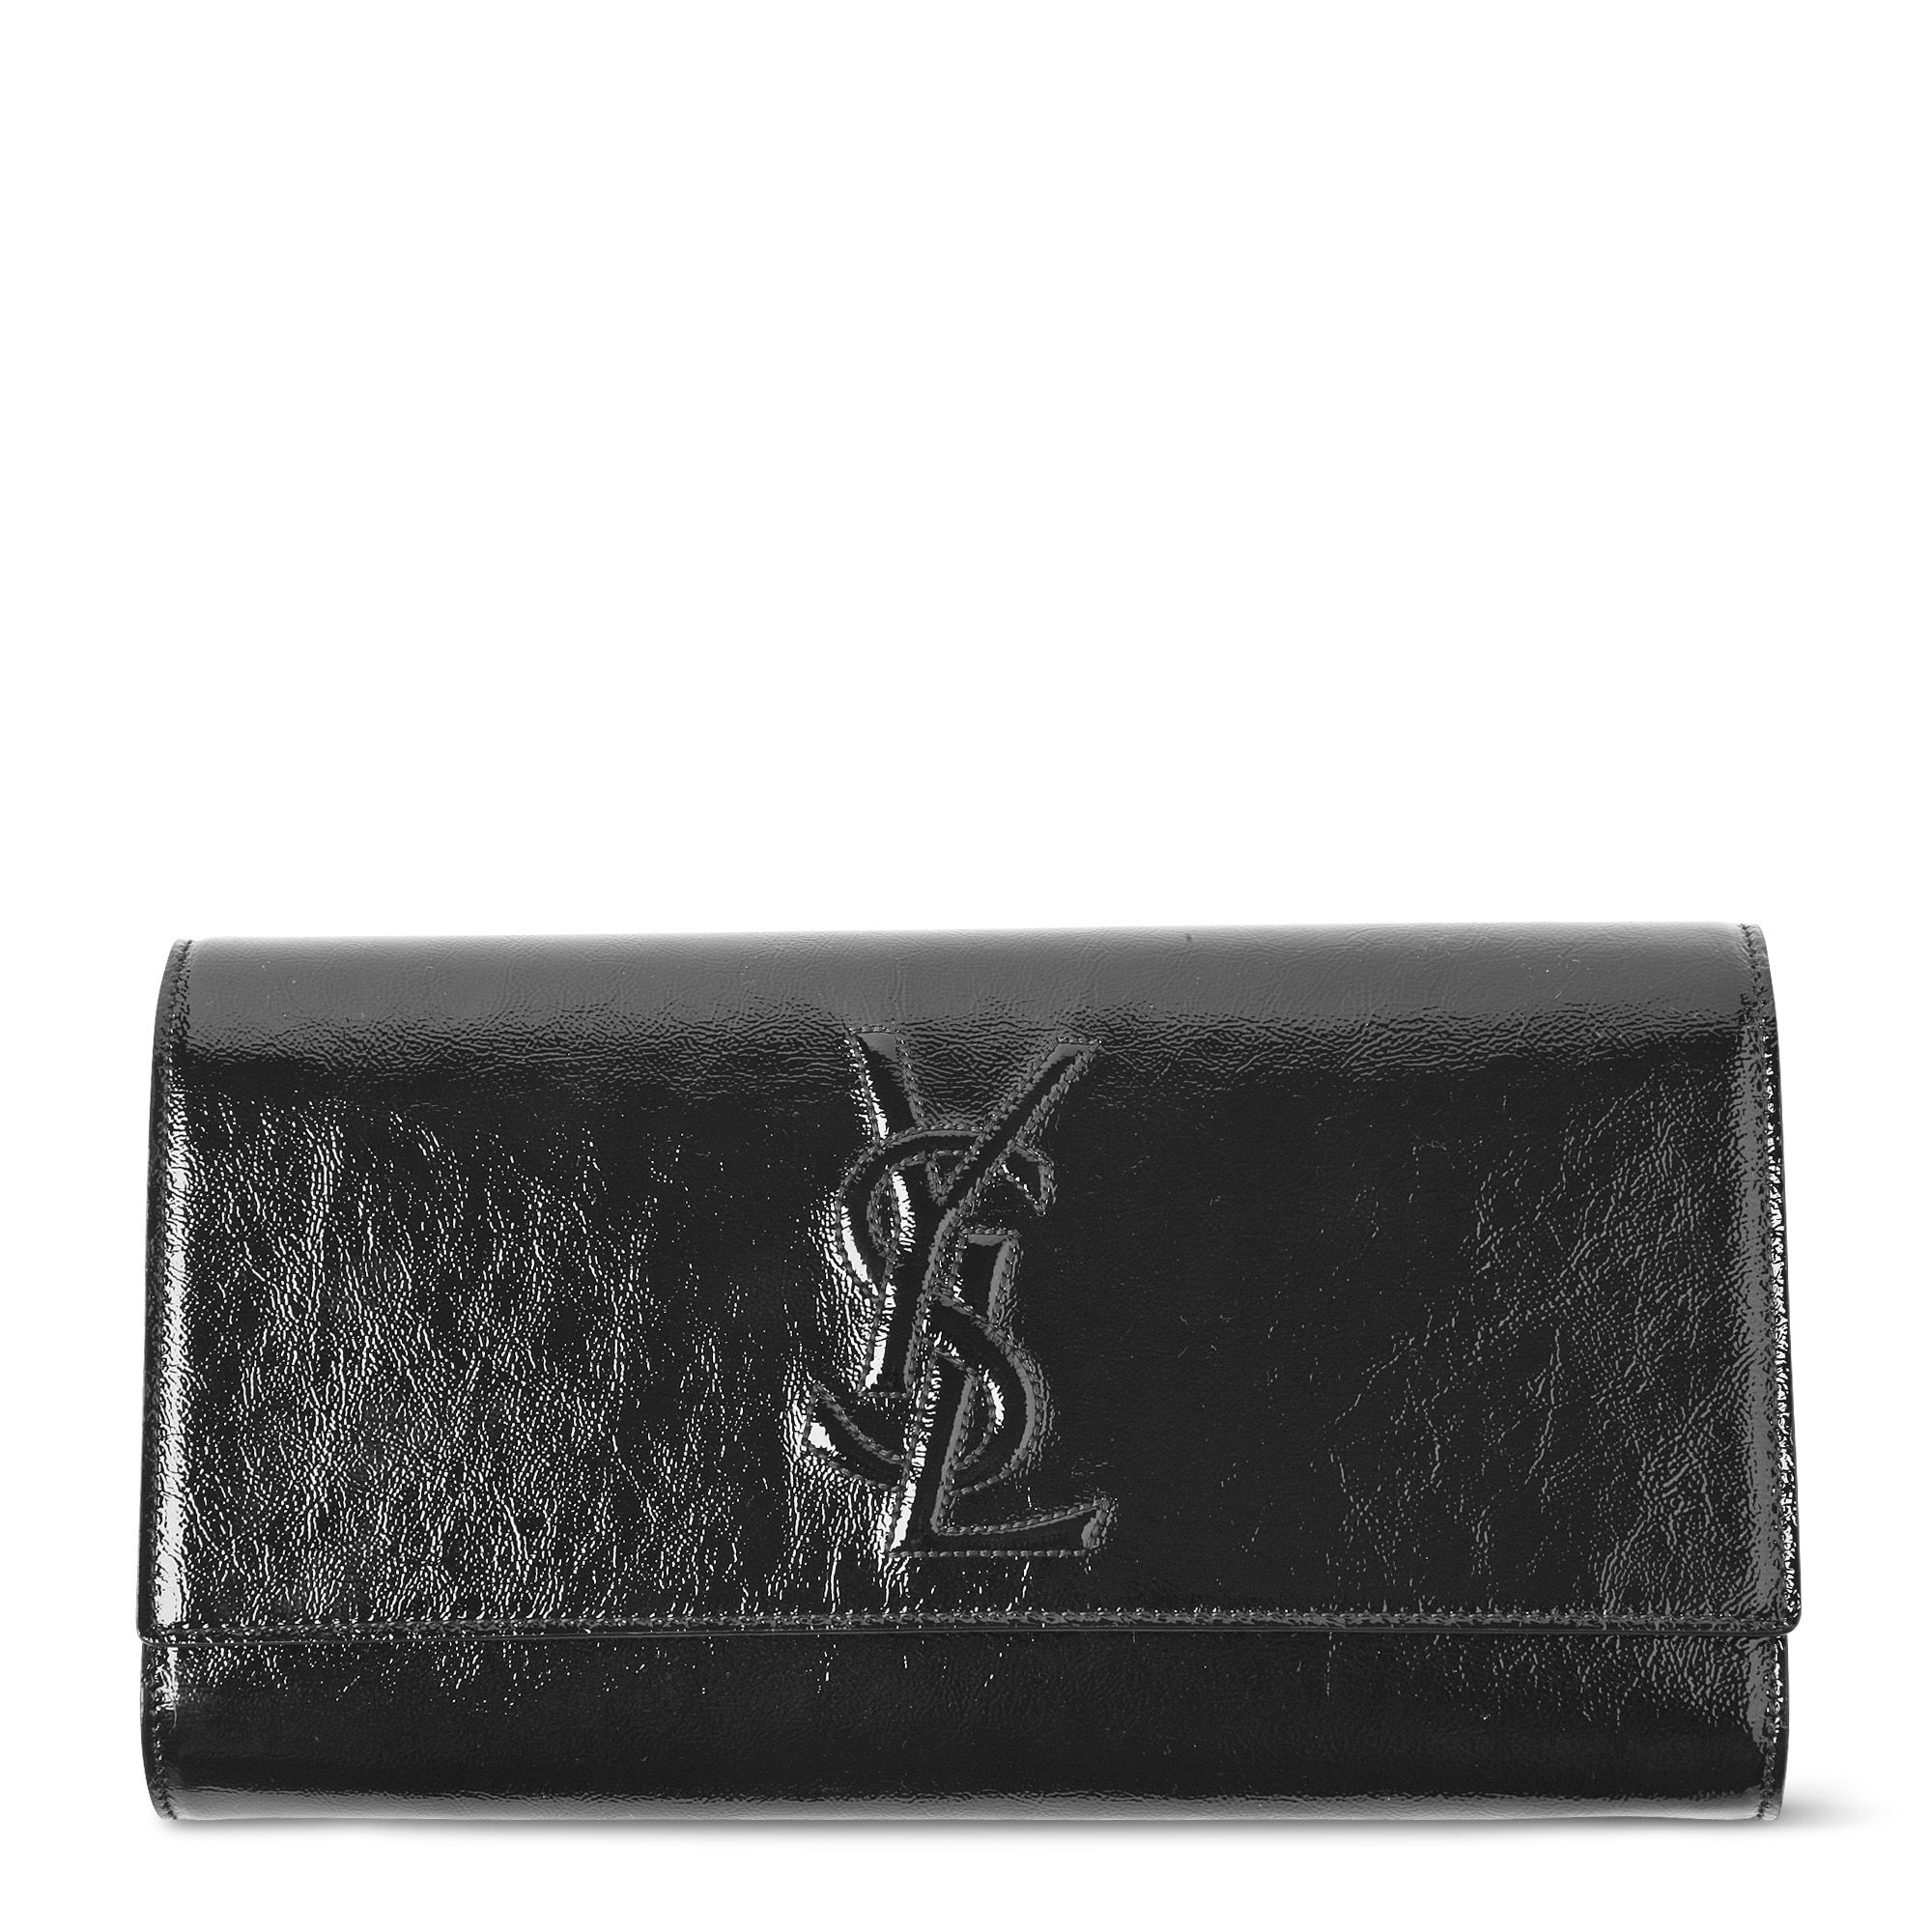 Saint laurent Belle De Jour Clutch Bag in Black | Lyst